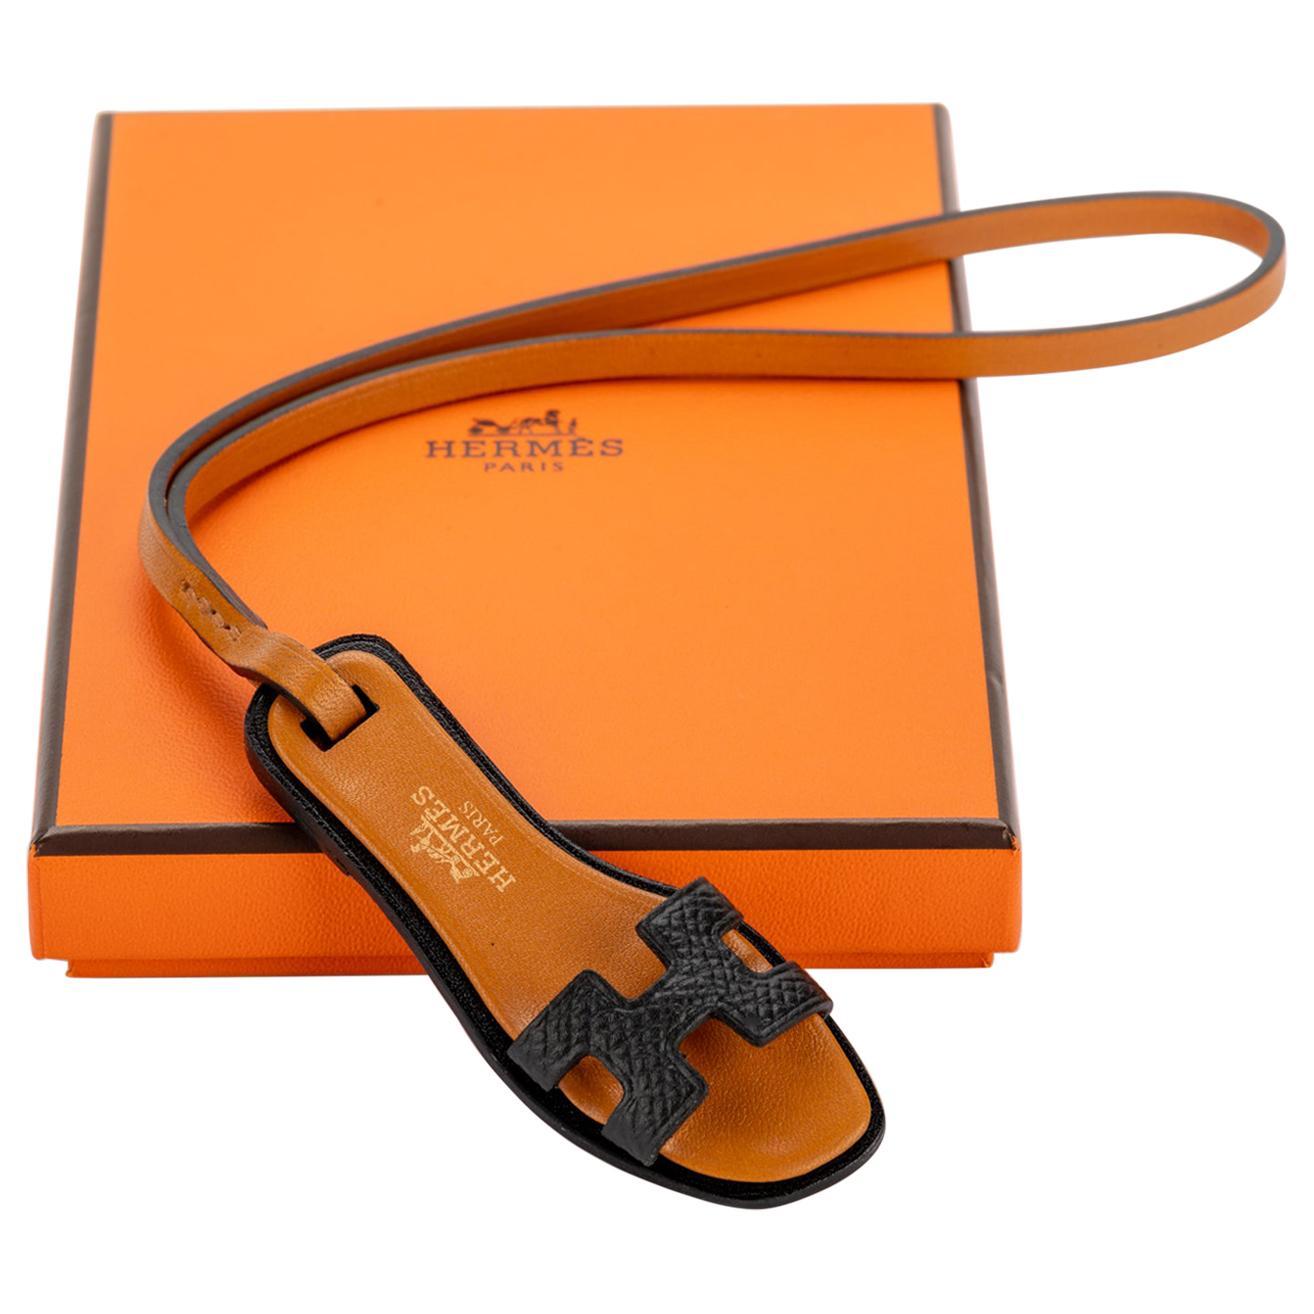 New in Box Hermes Rare Oran Black Bag Charm